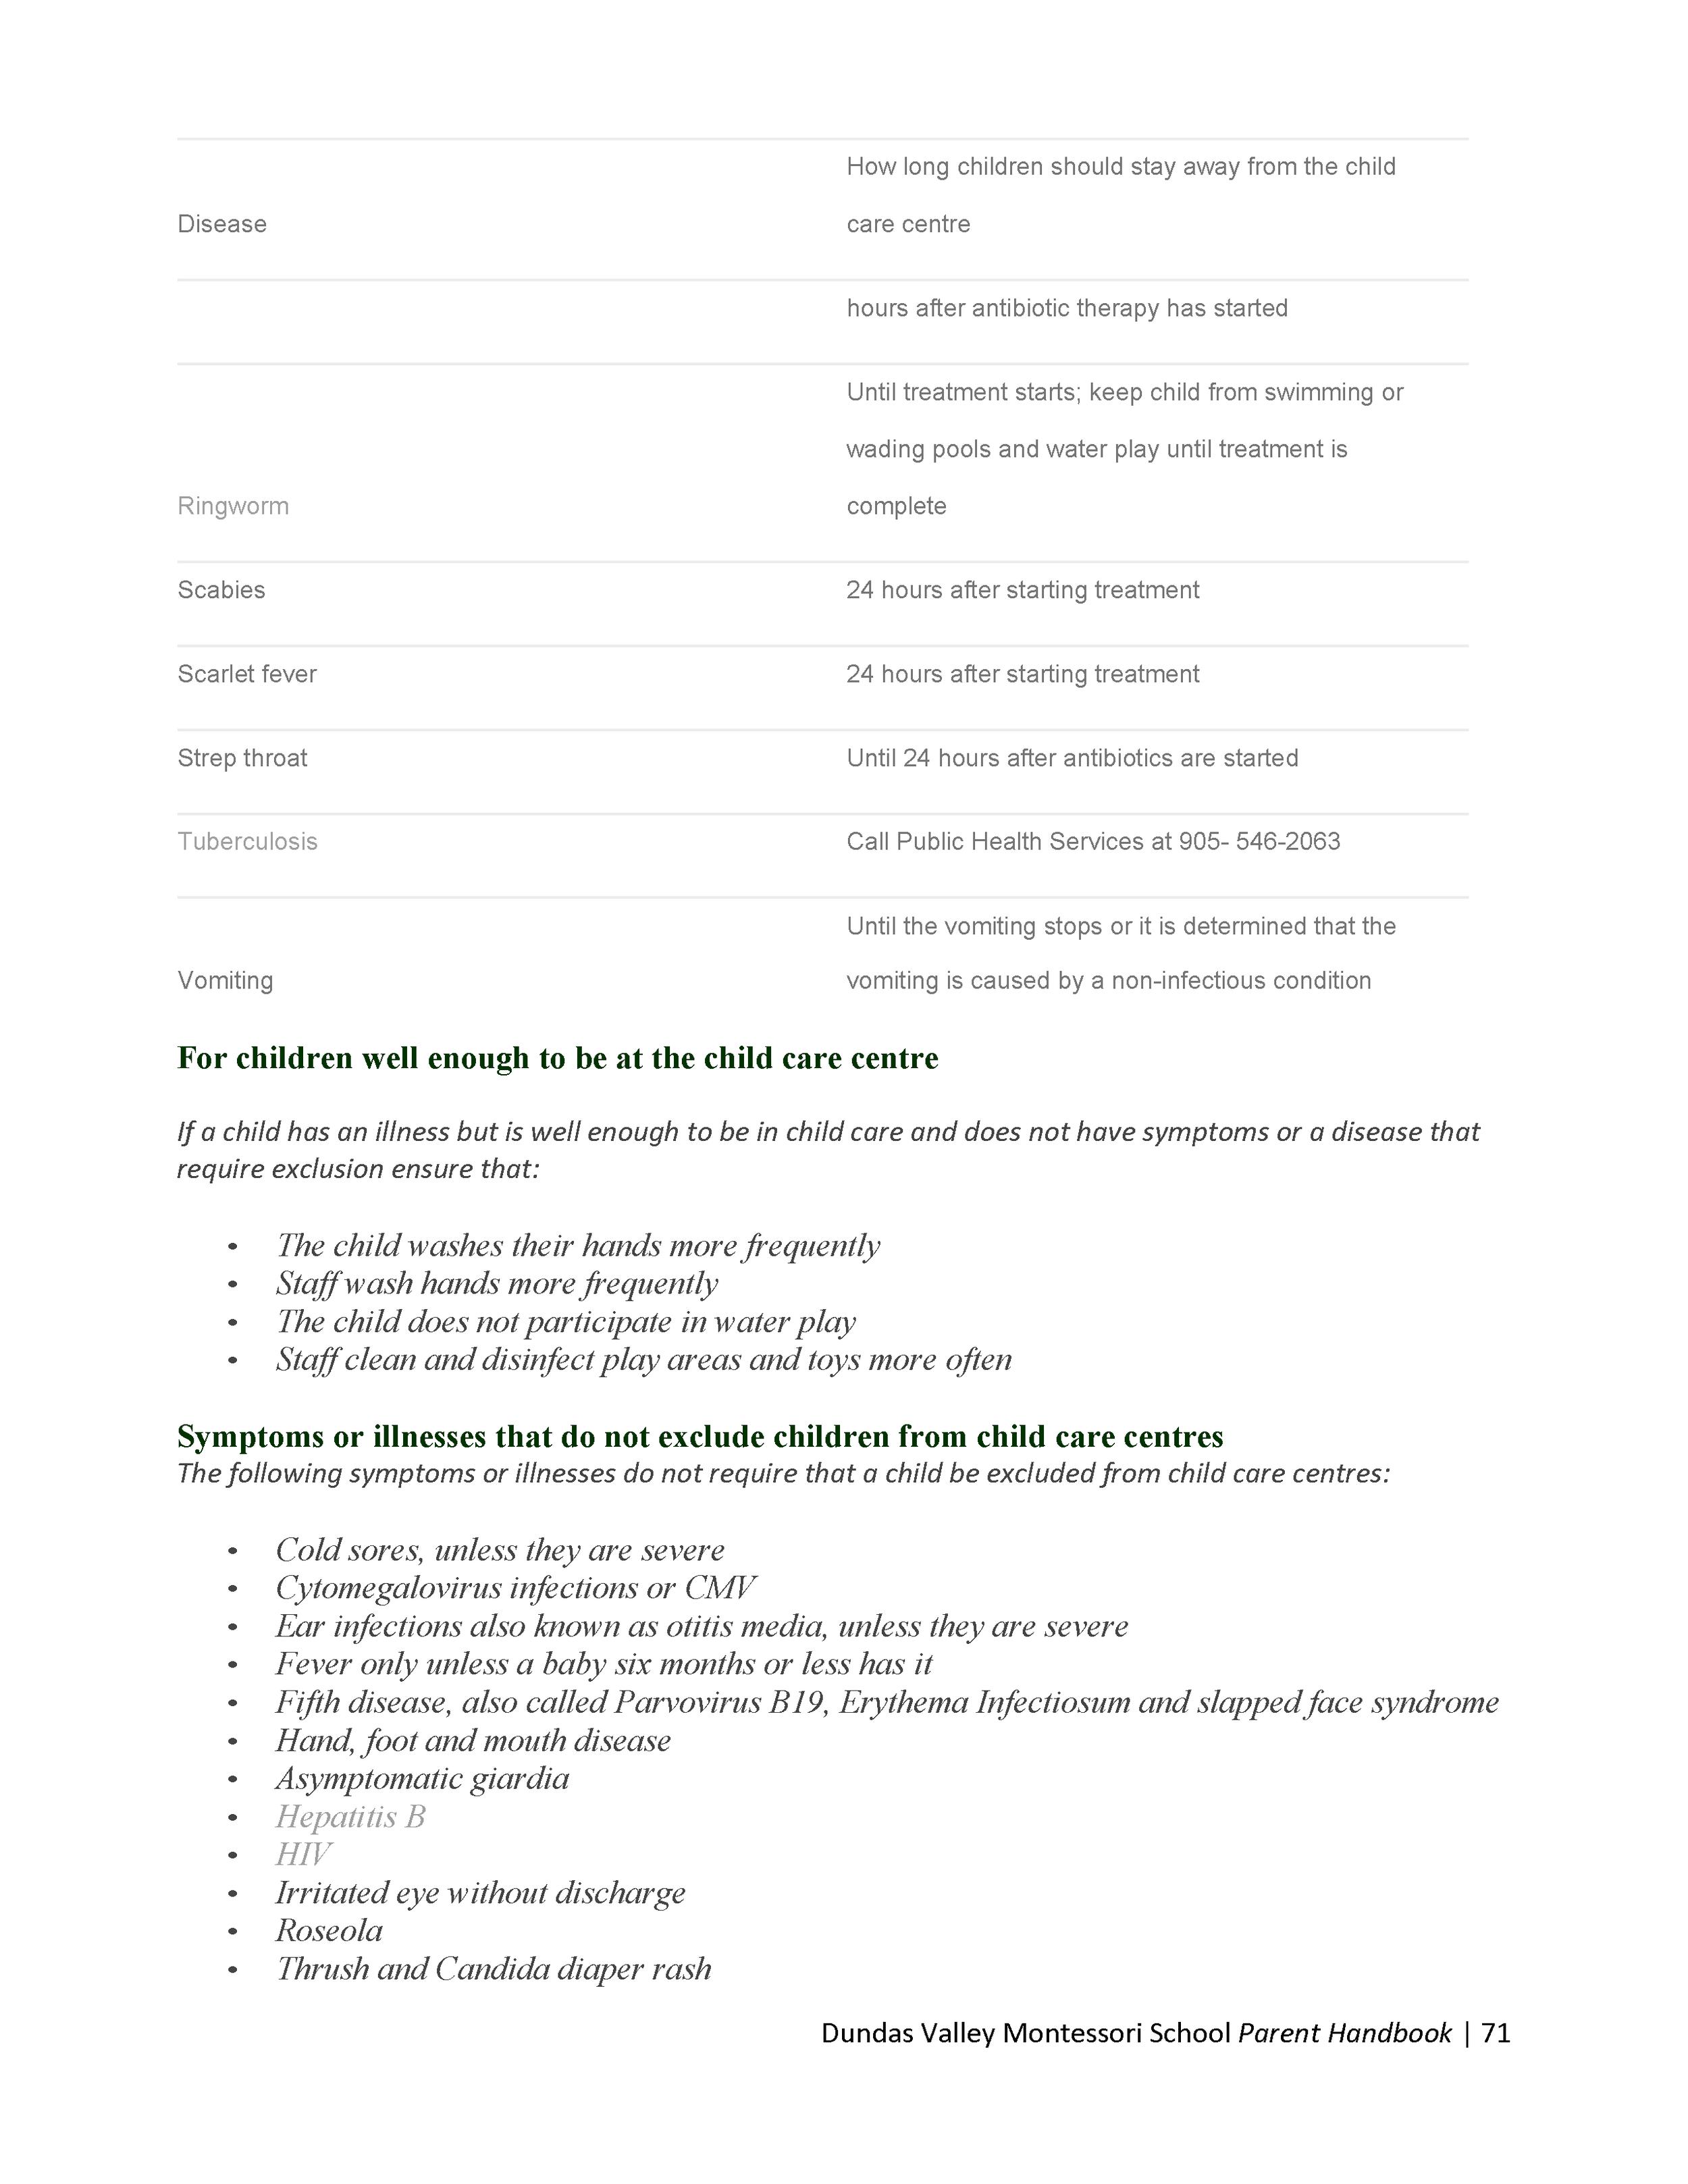 DVMS-Parent-Handbook-19-20_Page_073.png